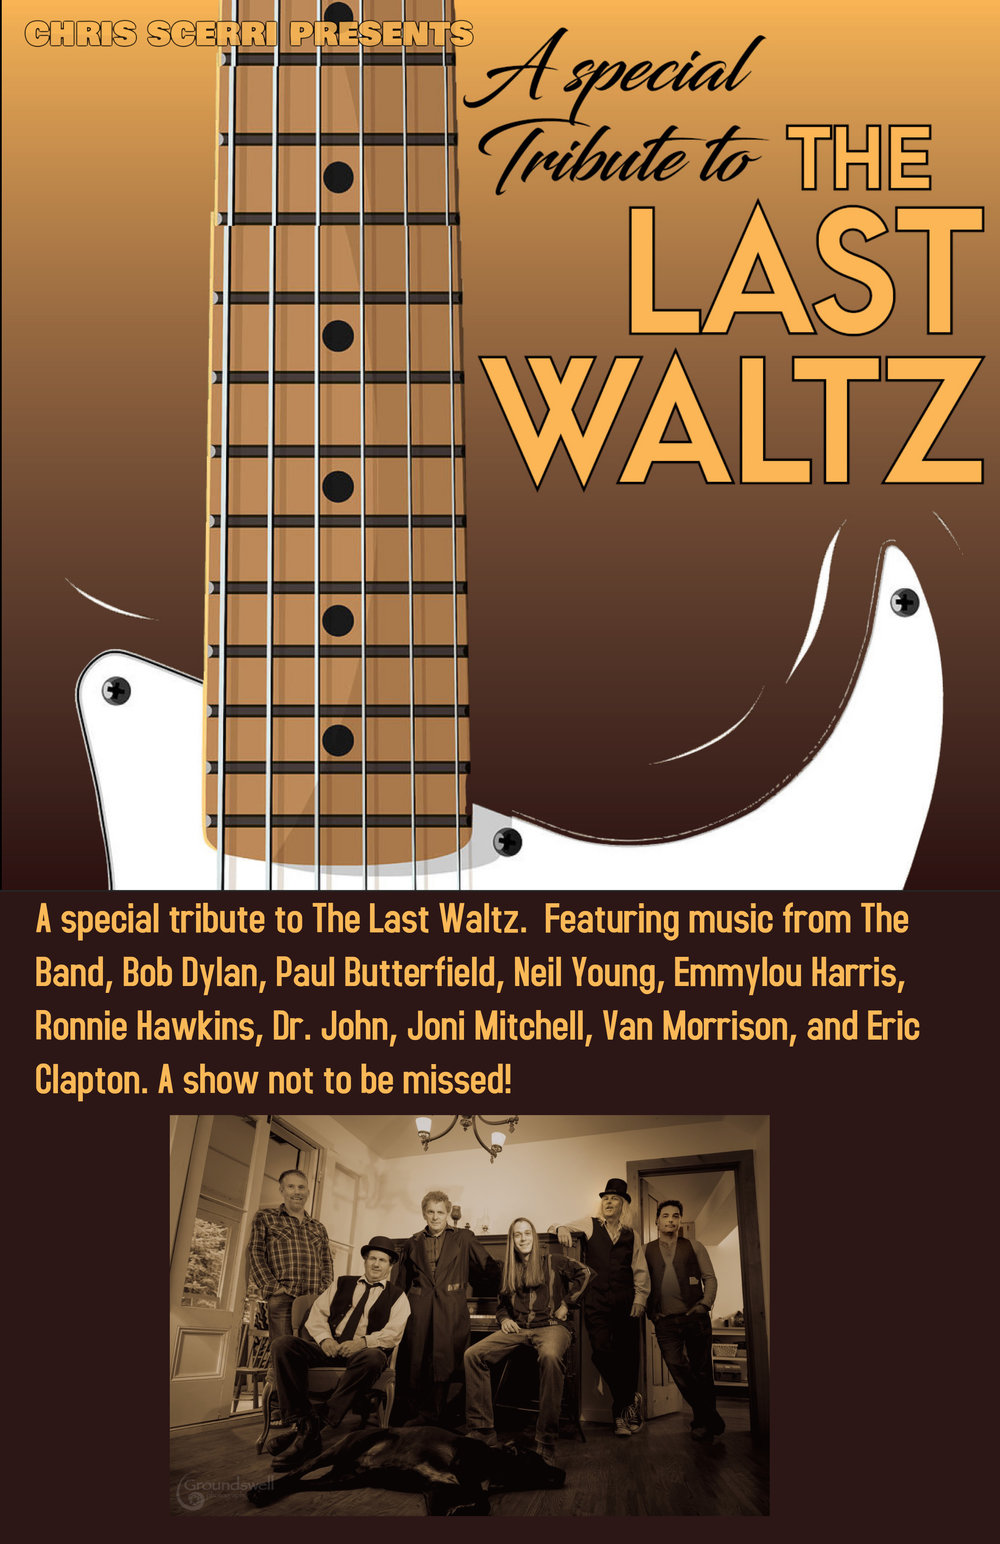 Last Waltz Touring Show Poster.jpg